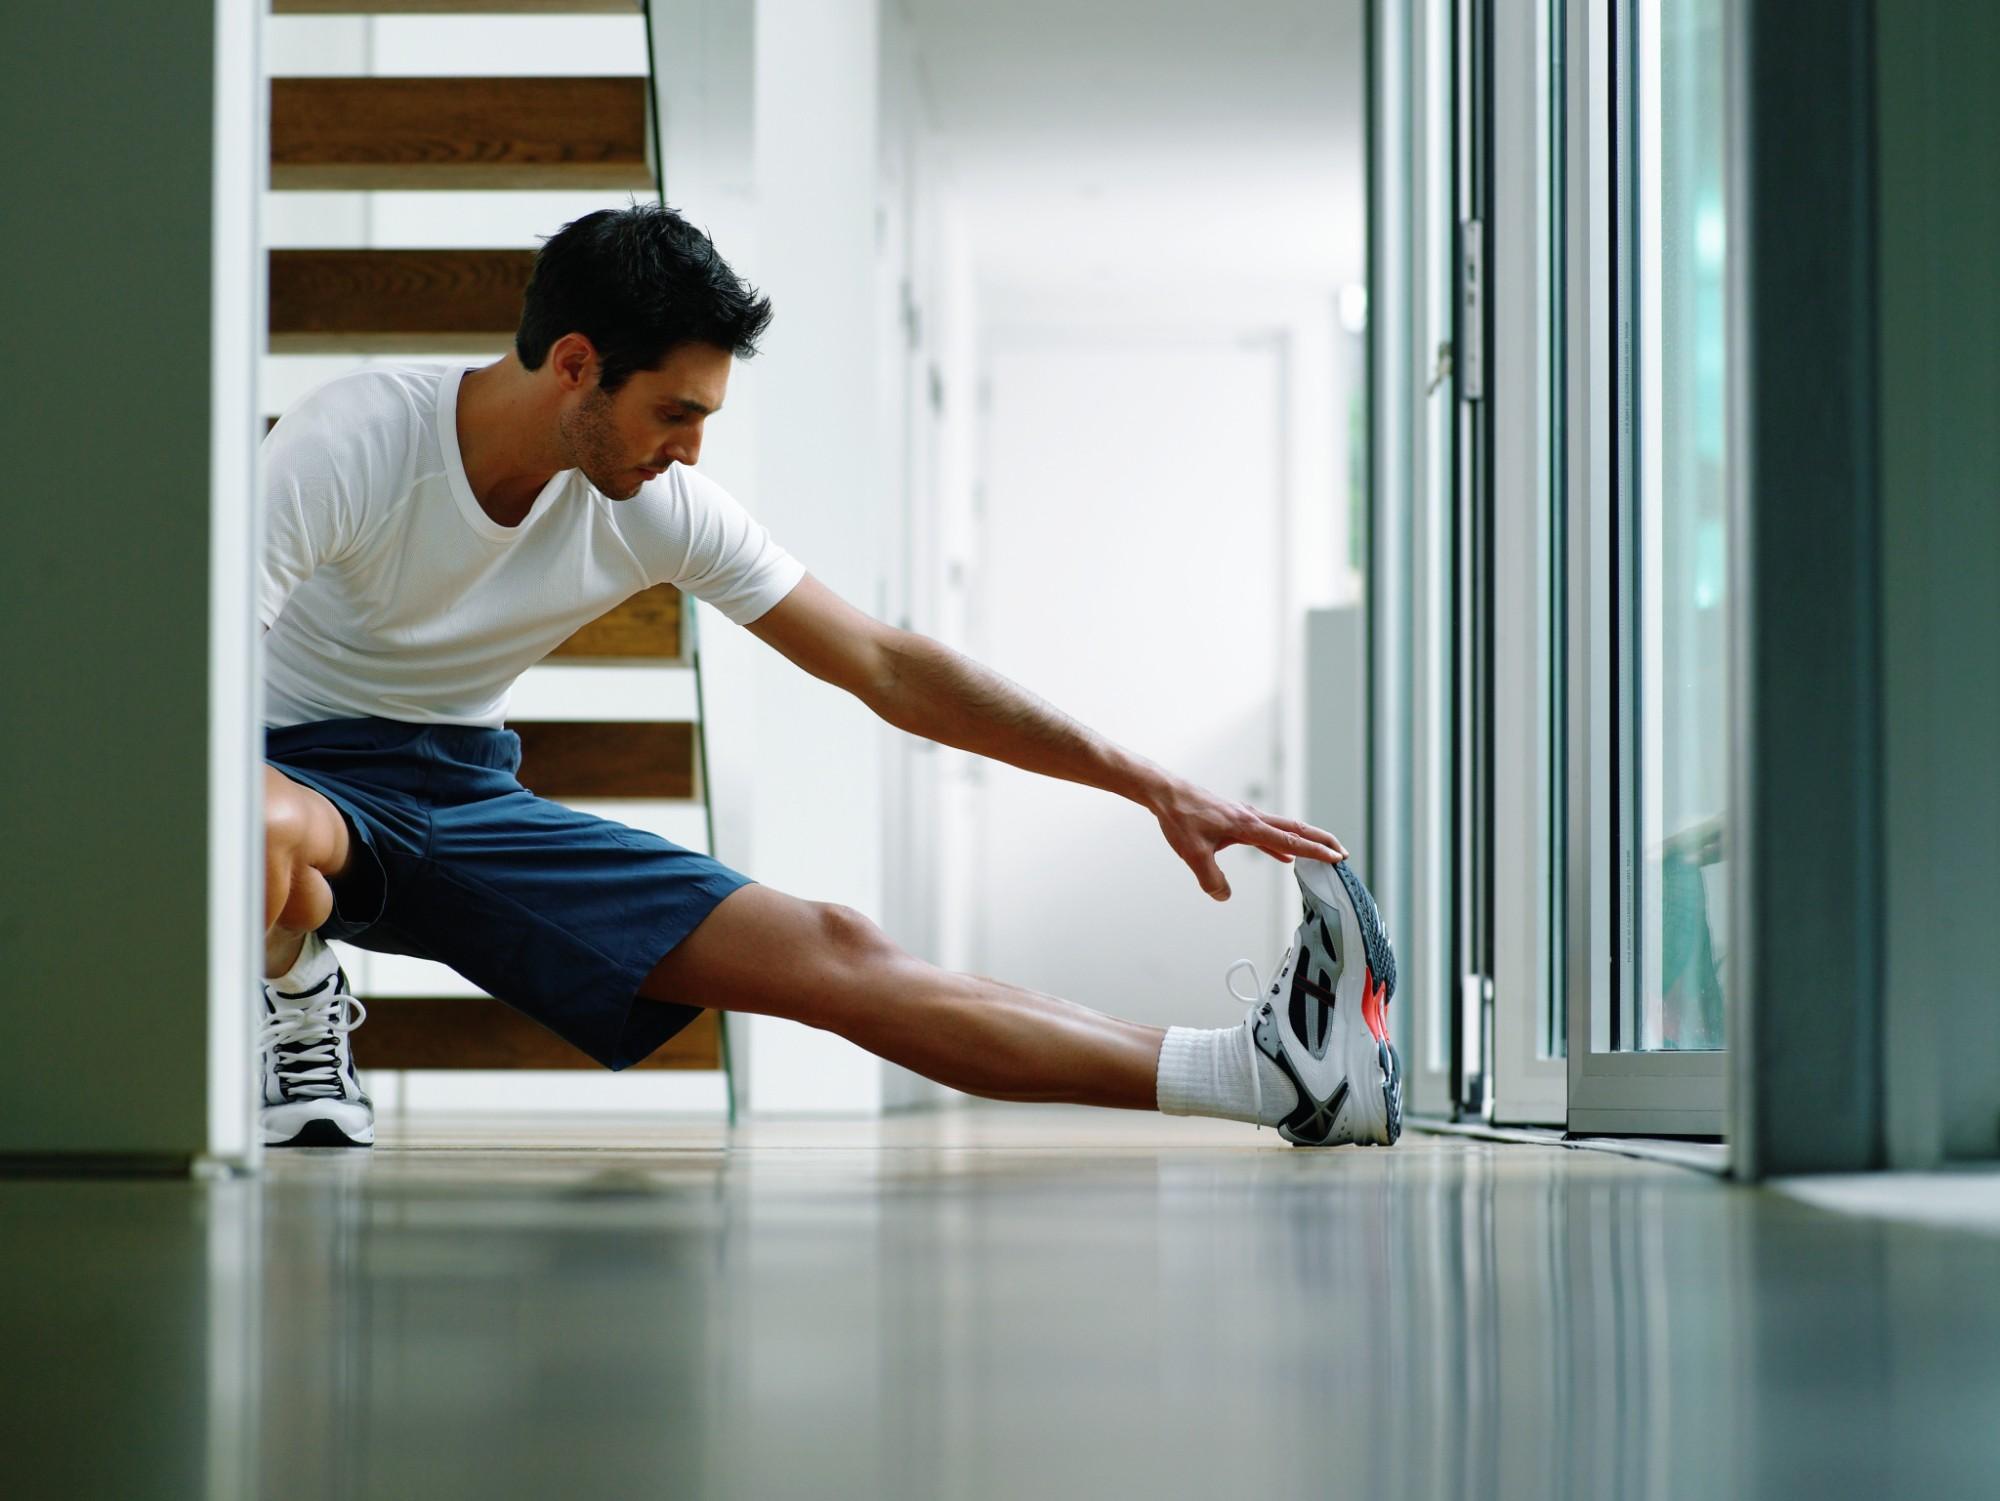 Exercício; alongamento; esporte; saúde (Foto: Thinkstock)